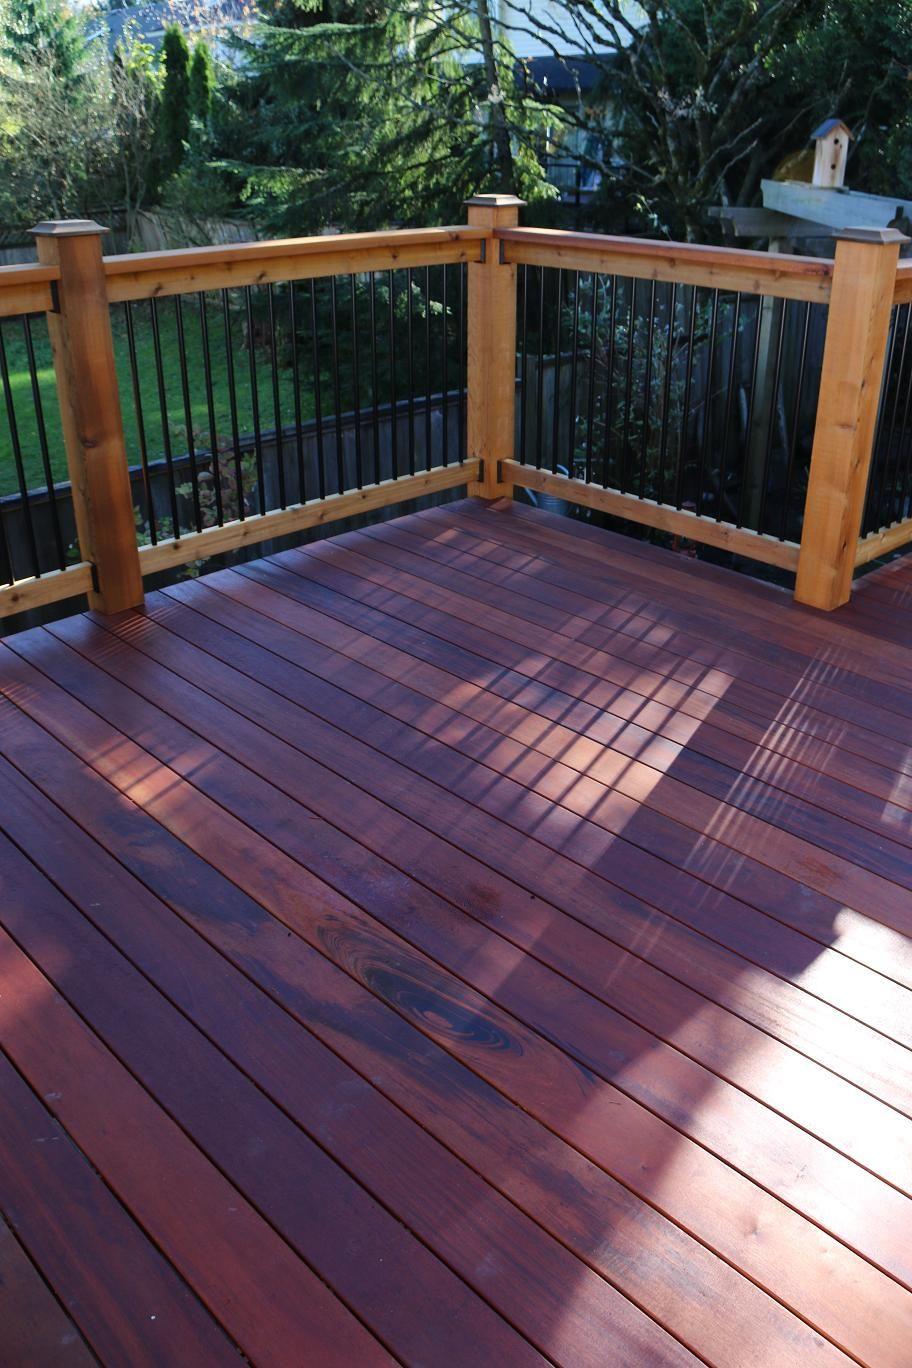 Residential Tigerdeck Tigerwood Hardwood Deck supplied by